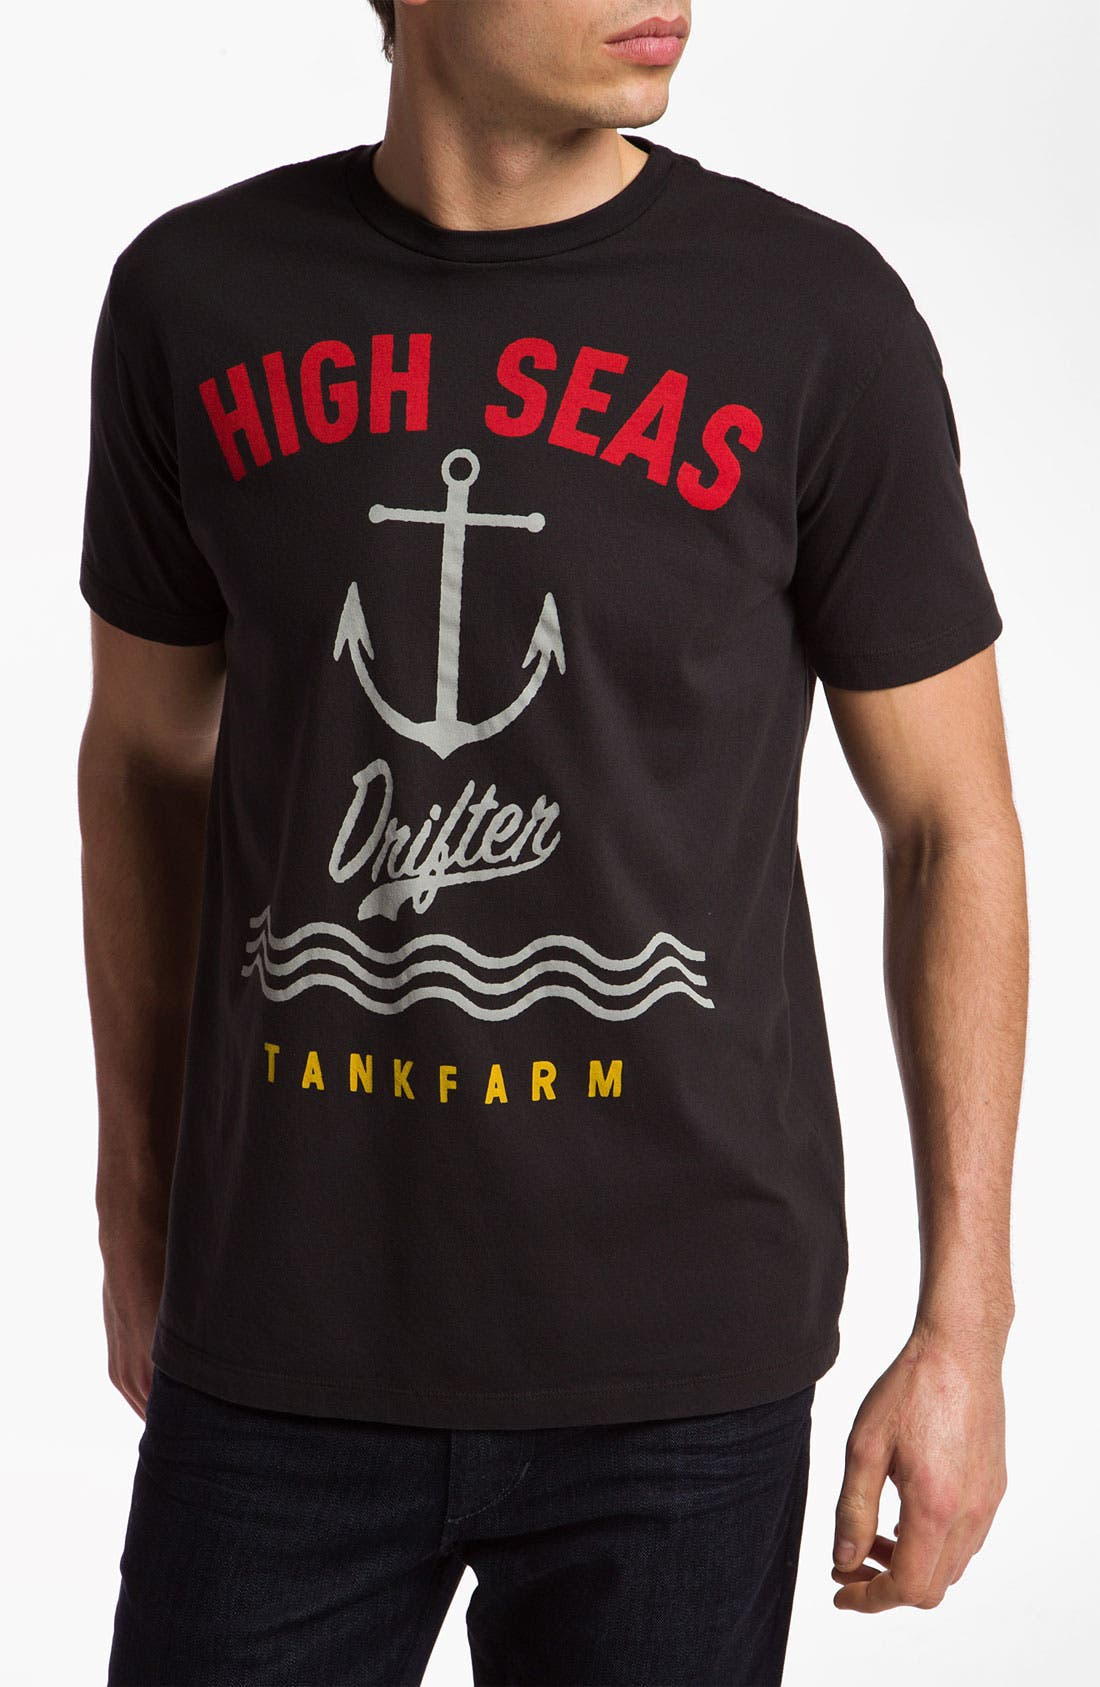 Alternate Image 1 Selected - Tankfarm 'High Seas Drifter' Graphic T-Shirt